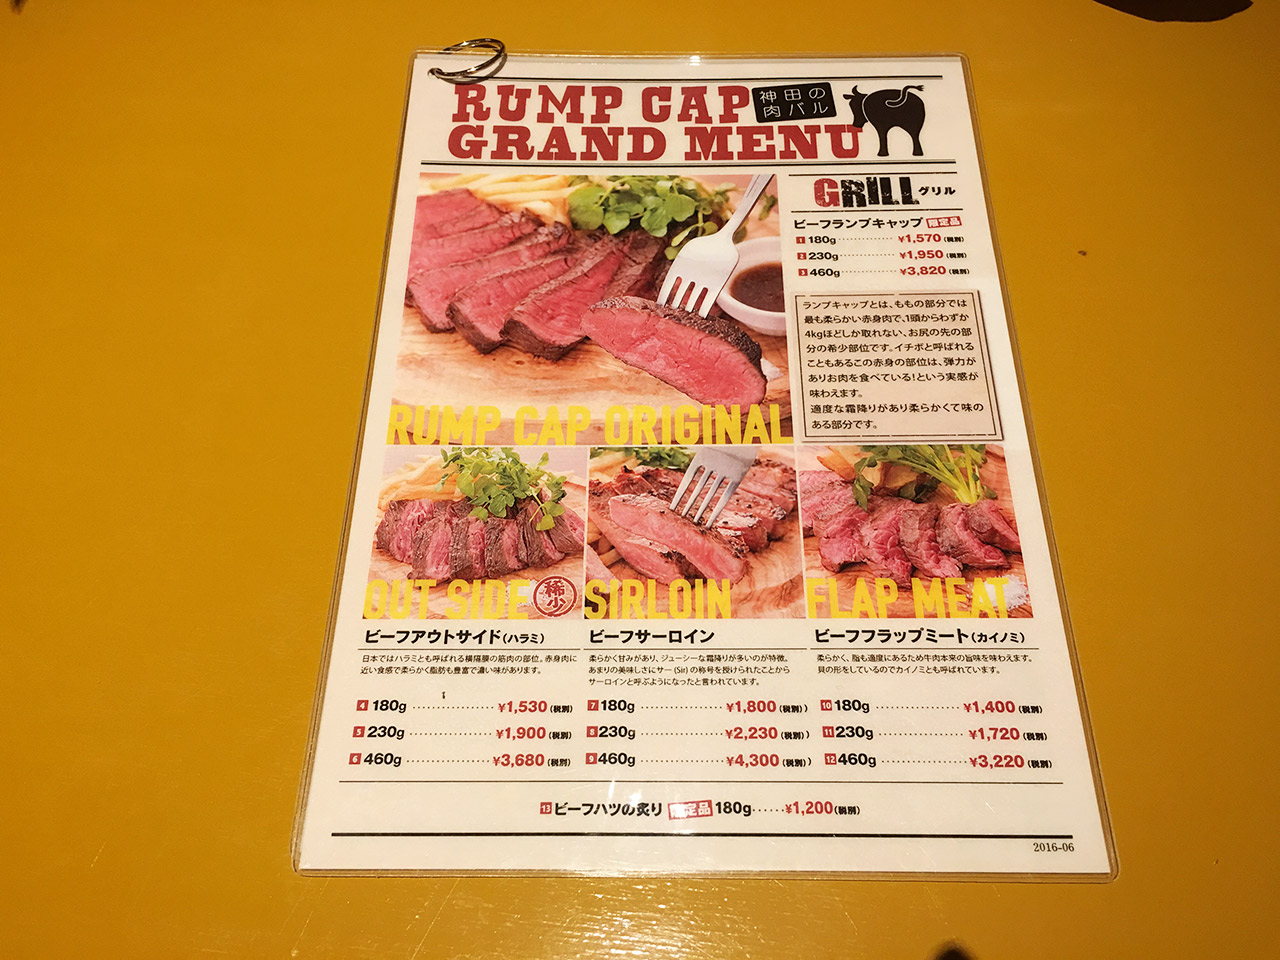 tachikawa-shokuniku-yokocho-rumpcap-menu01